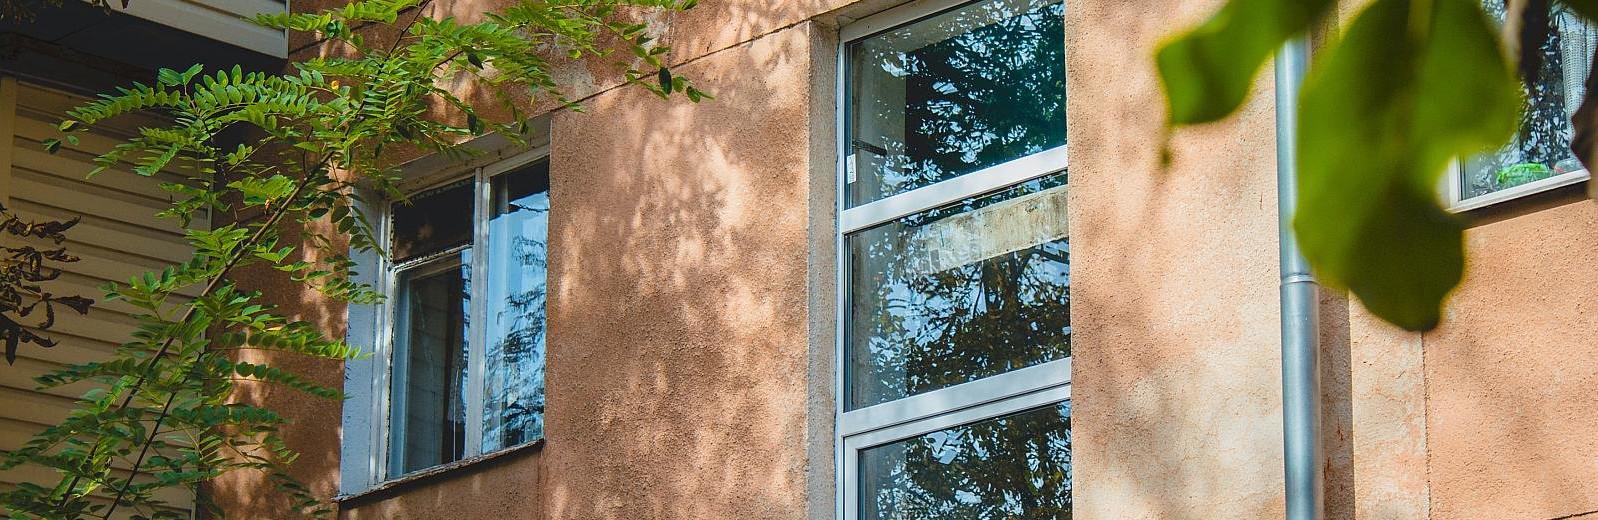 окна при ремонте